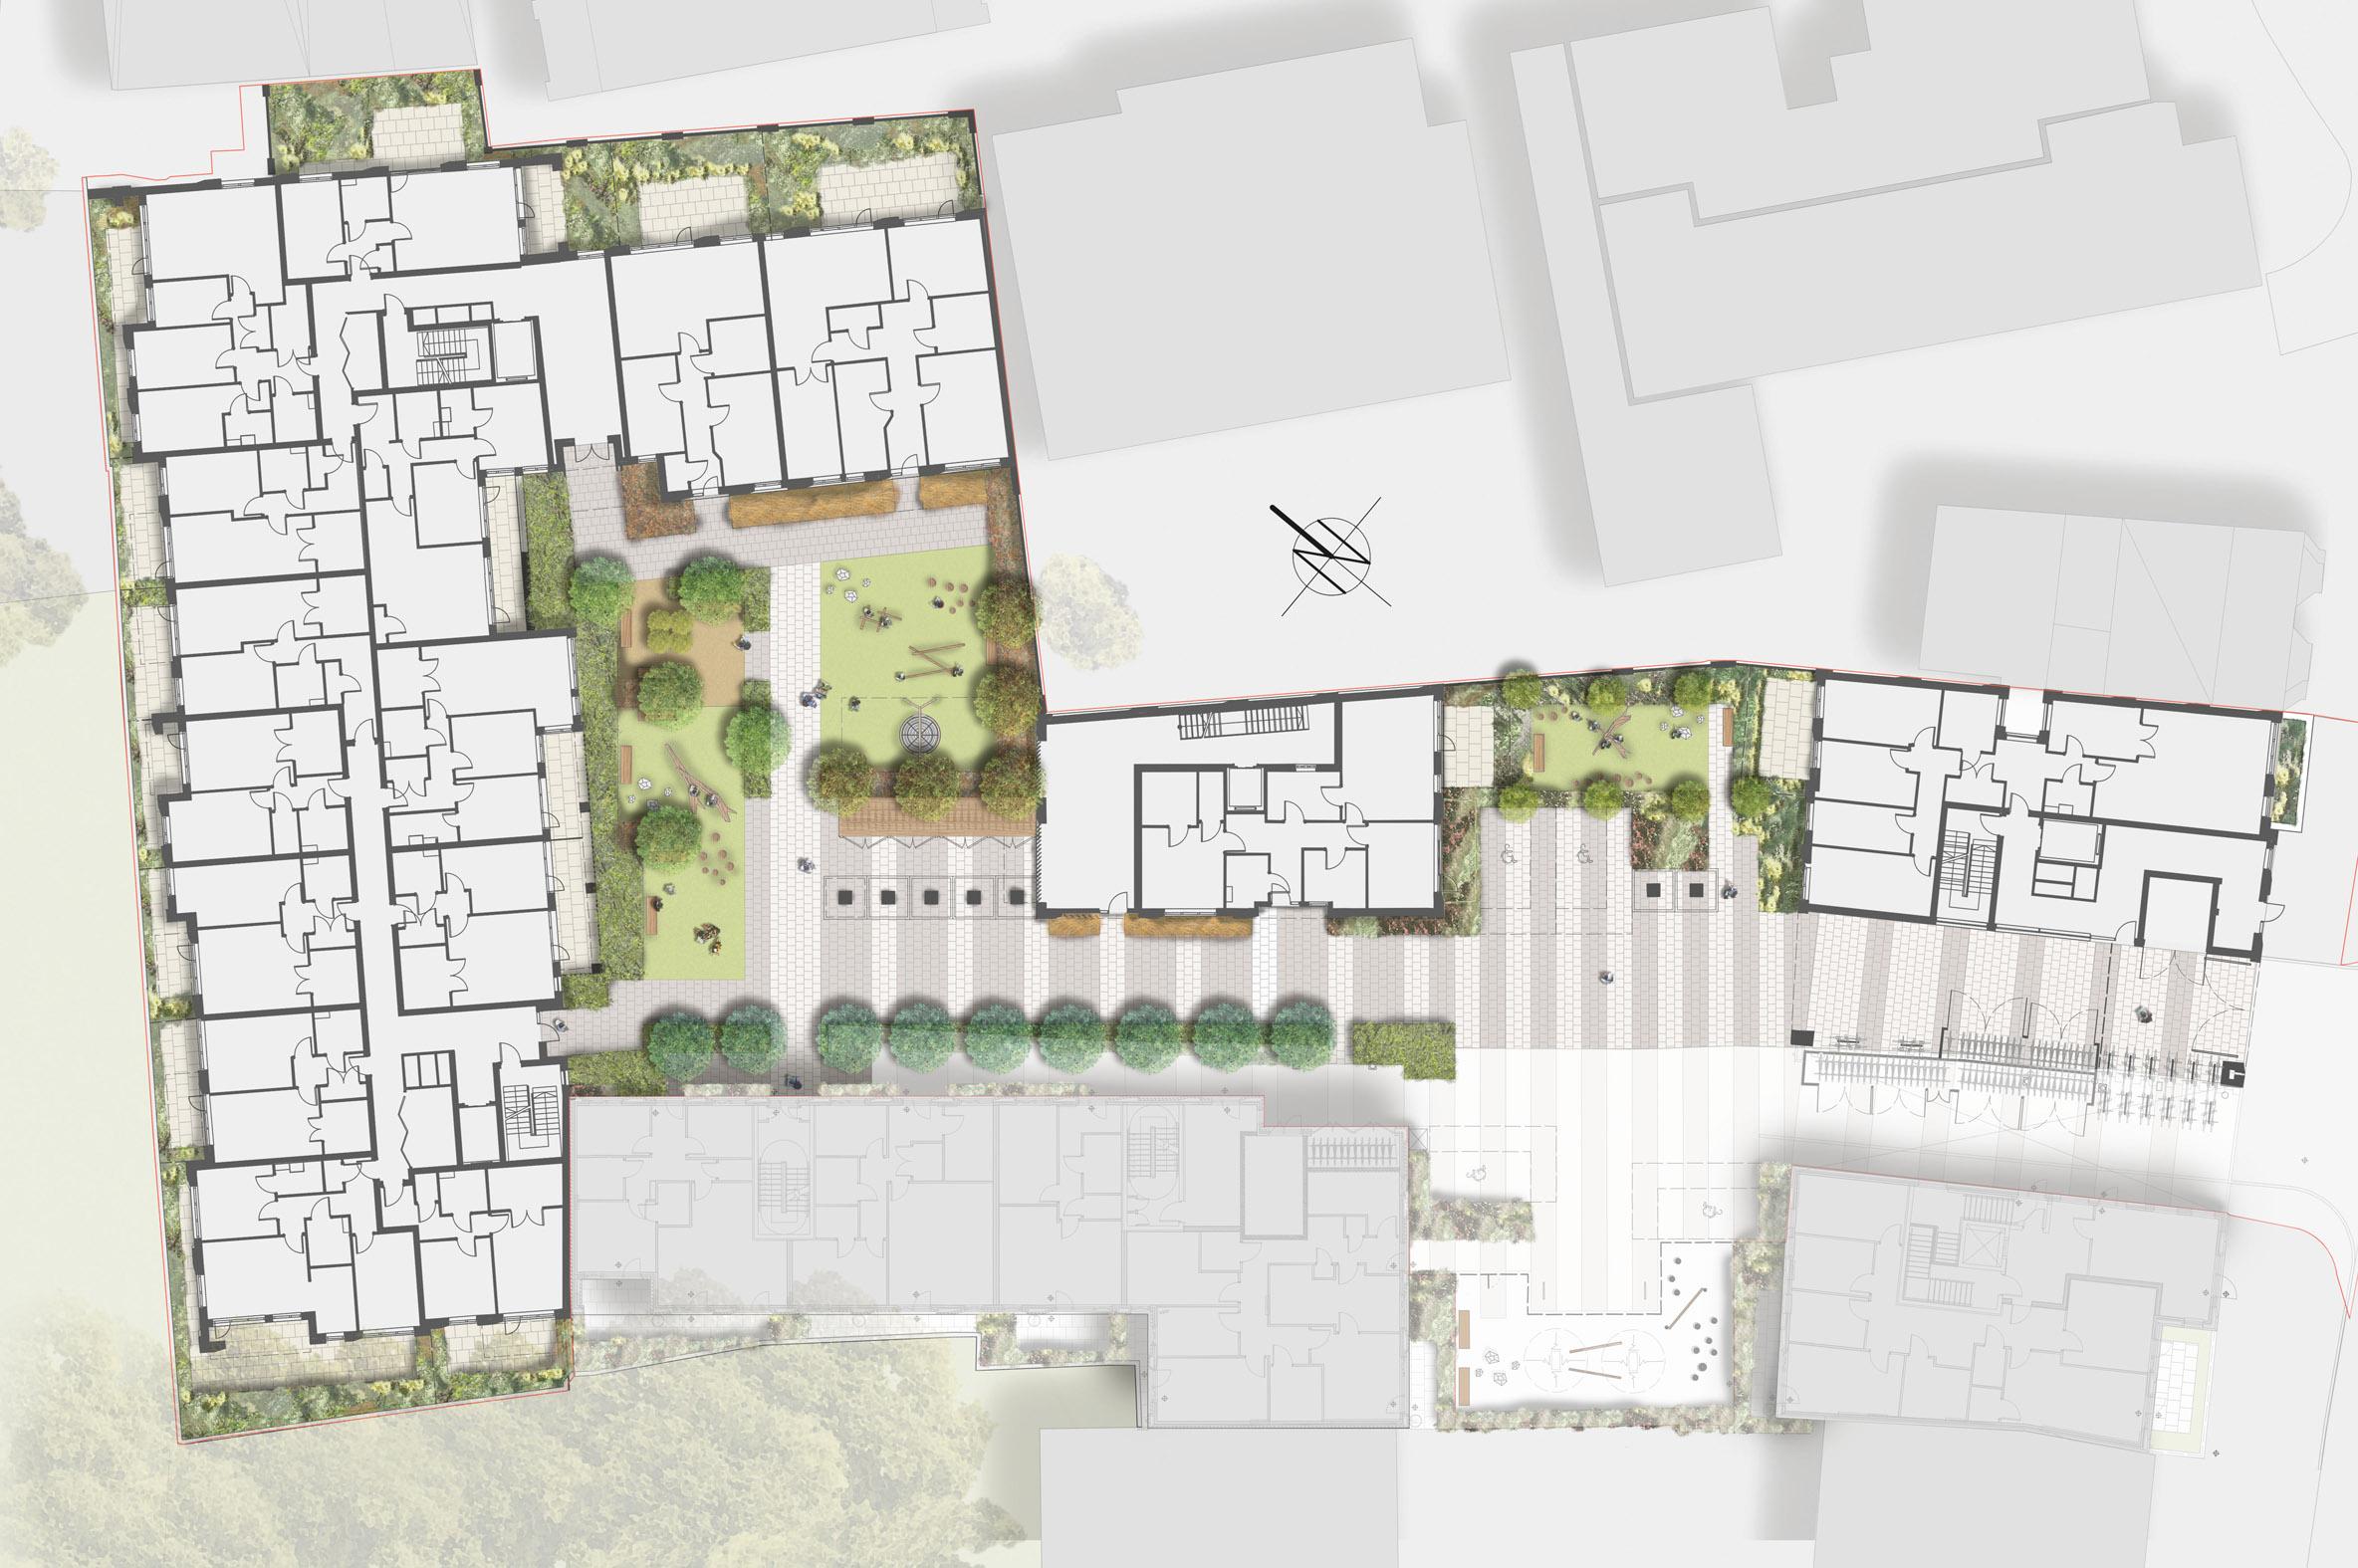 Bow road landscape design davis landscape architects for Outer space design landscape architects